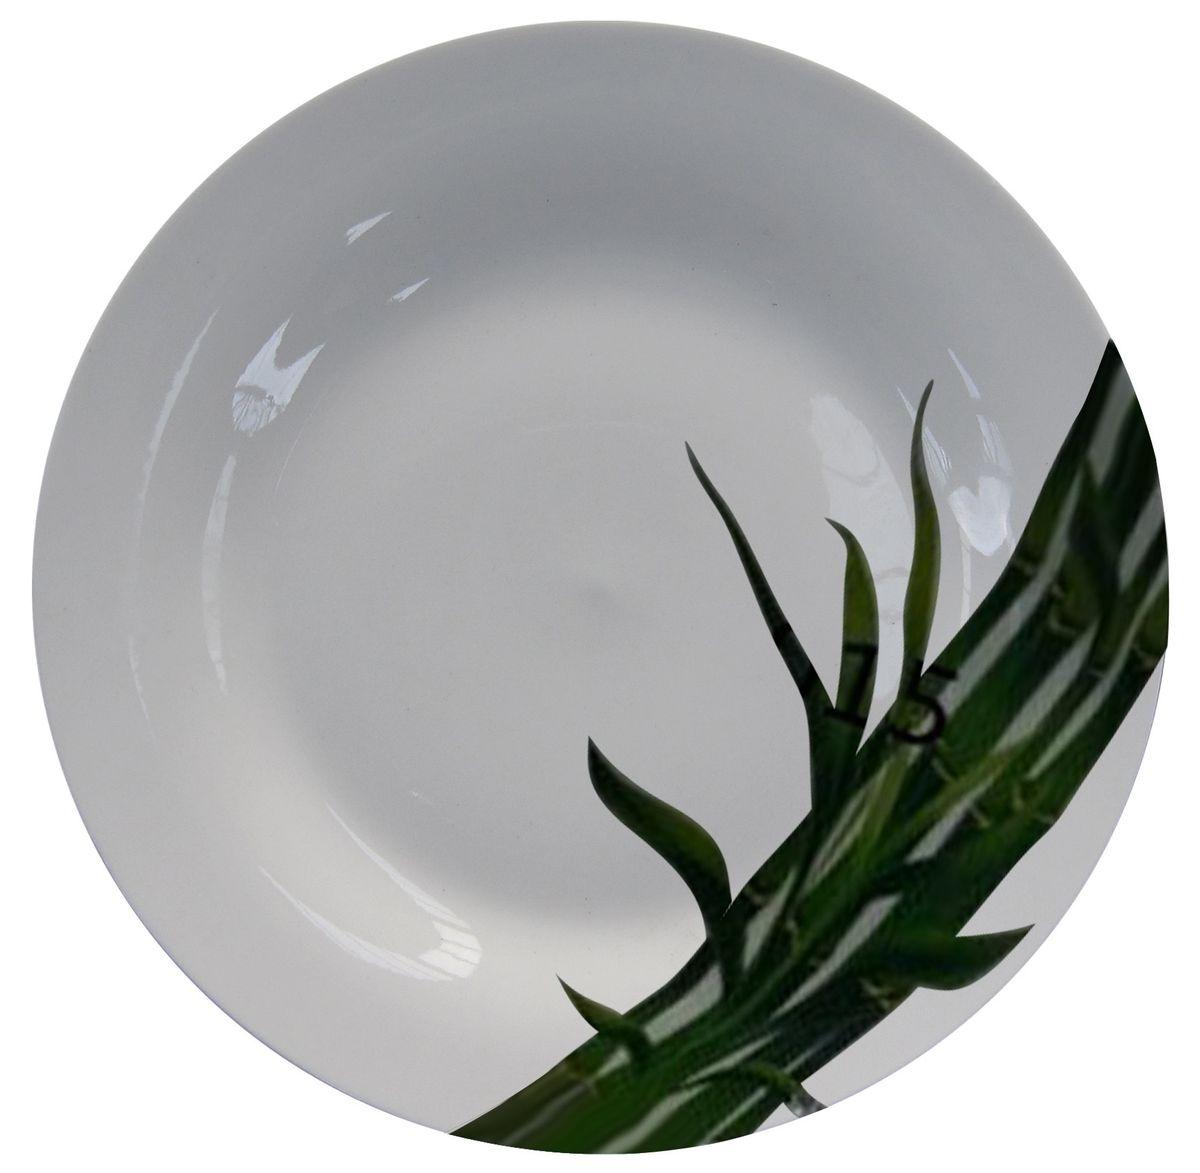 Тарелка МФК-профит Бамбук, 23 х 2,2 смMFK09017